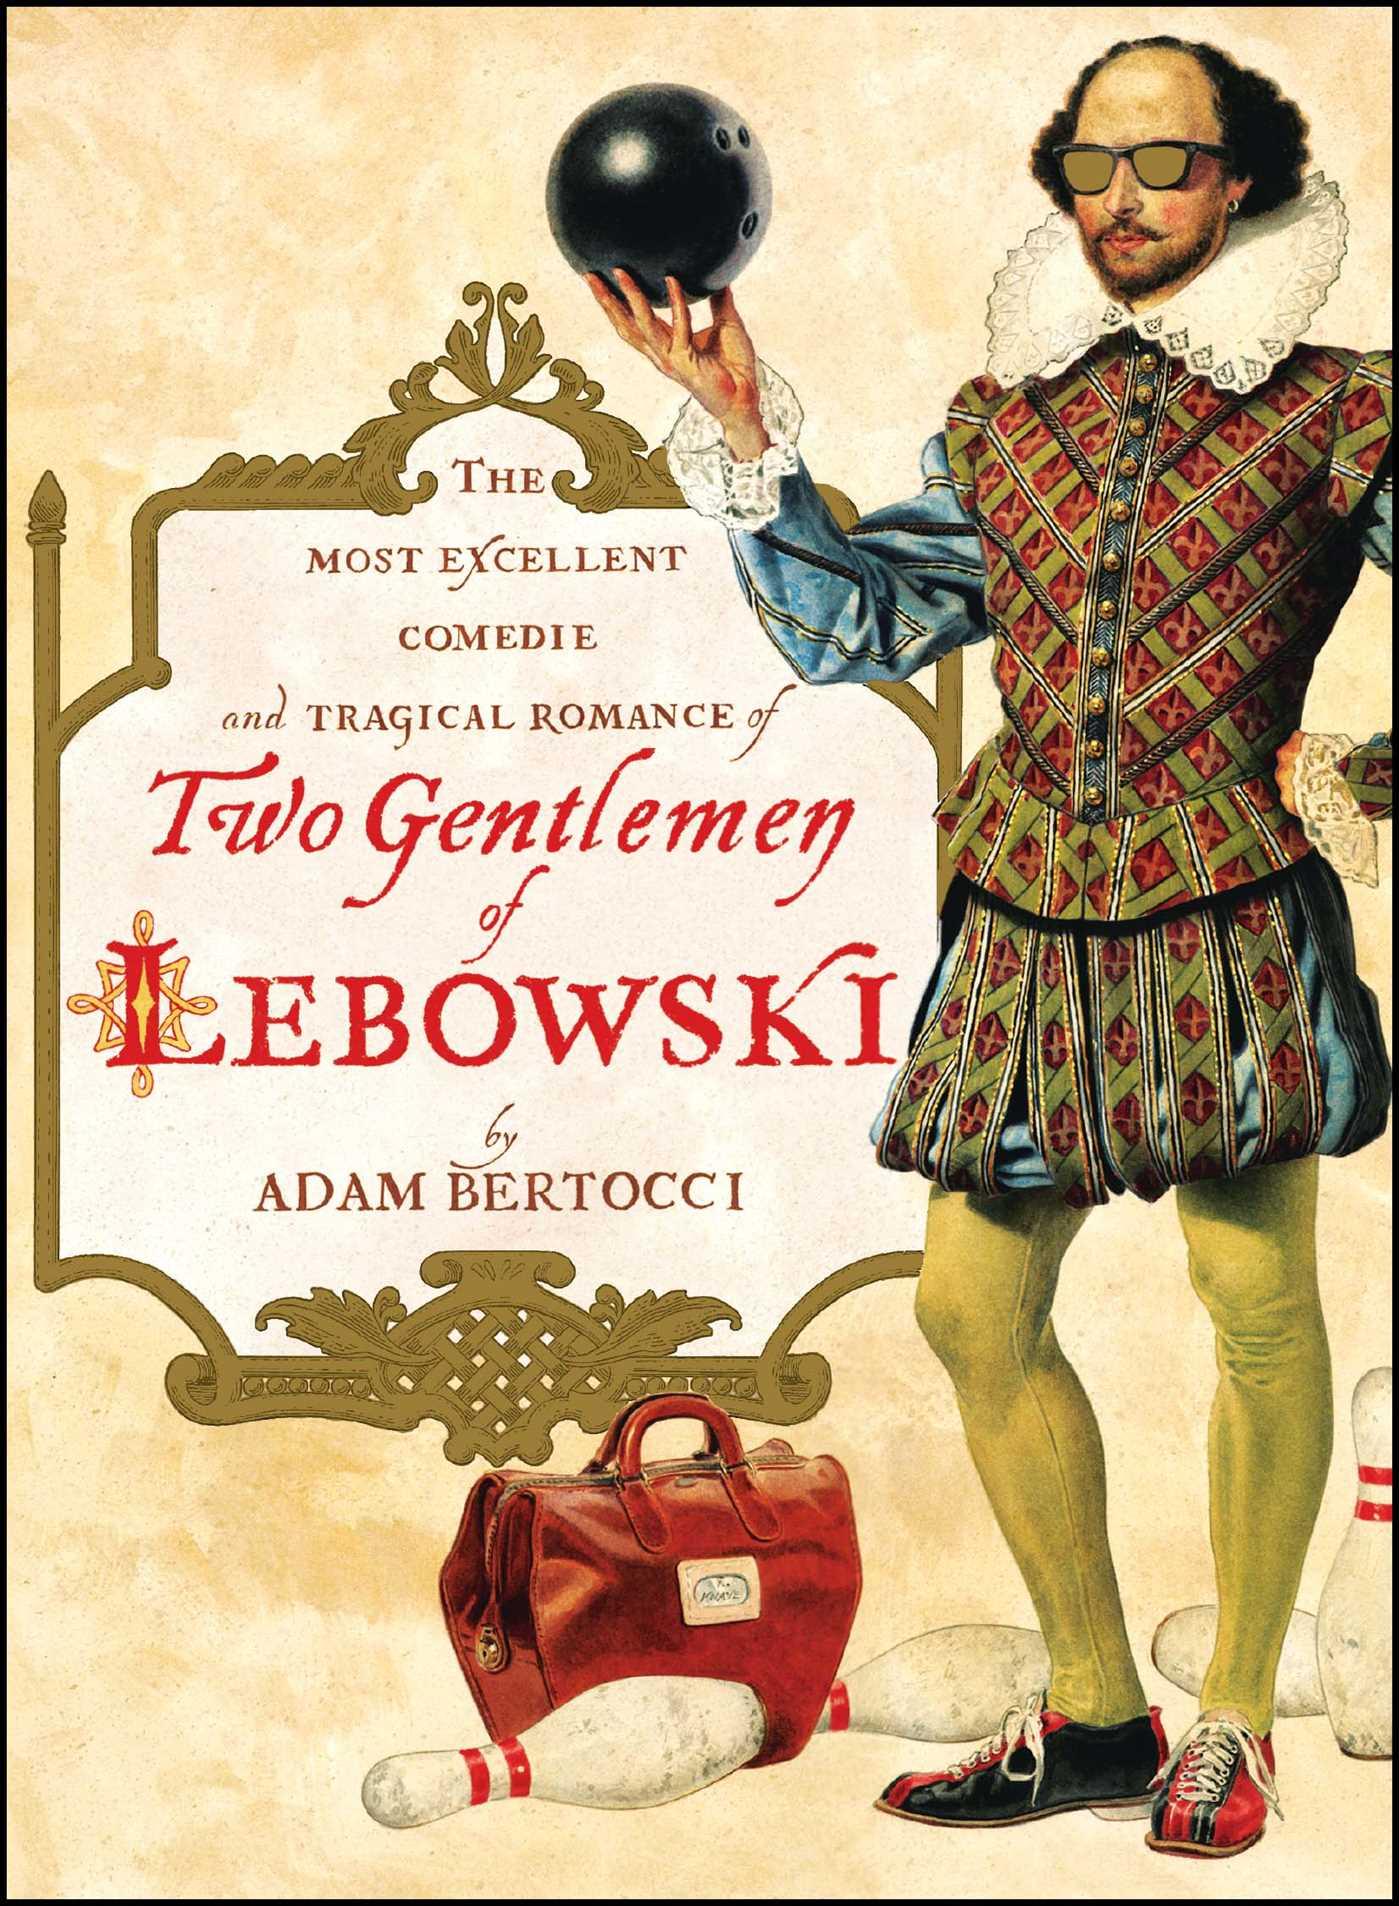 Two gentlemen of lebowski 9781451605839 hr